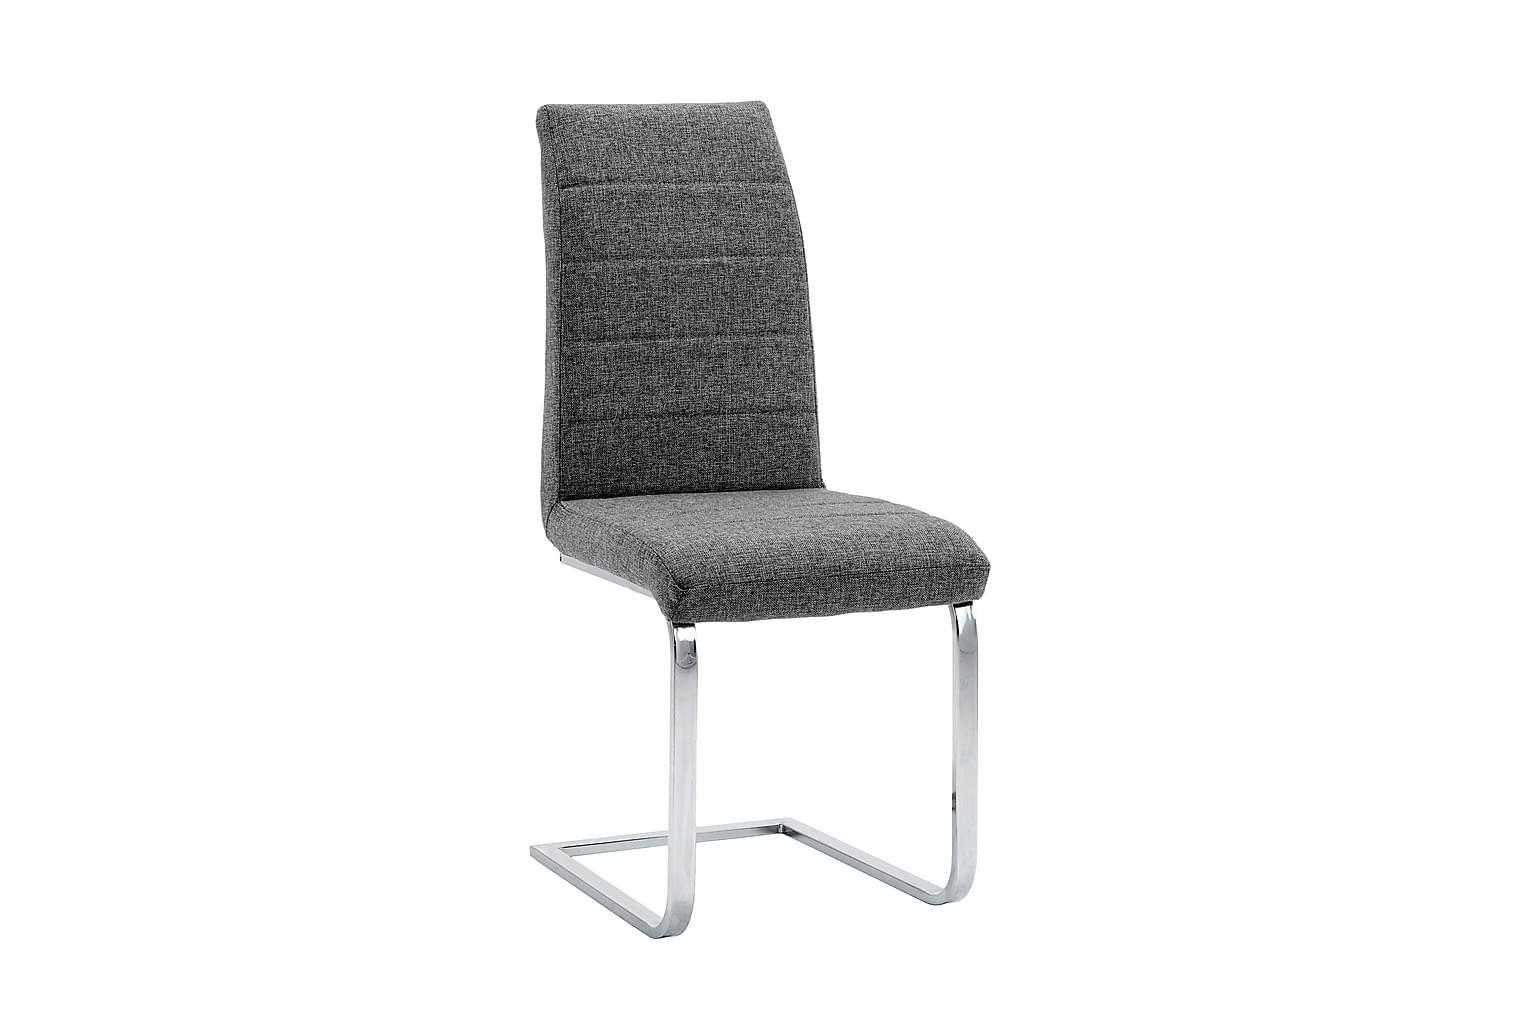 EMÅN Tuoli 2-pak Harmaa